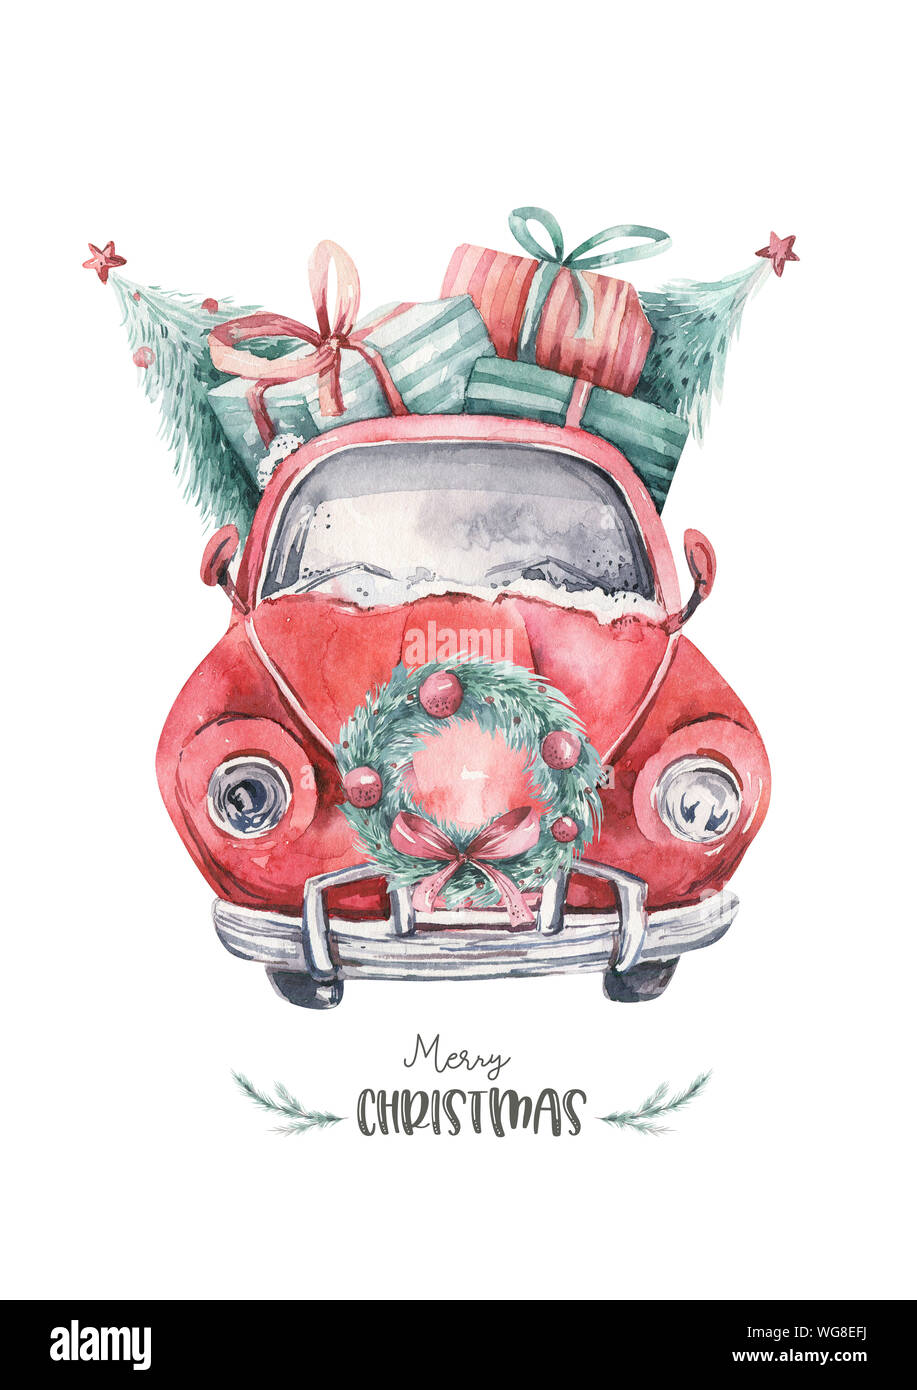 Watercolor Wedding Watercolor Sports Car Holiday Card Holiday Clip Art Car Printable Watercolor Clip Art Christmas Printable